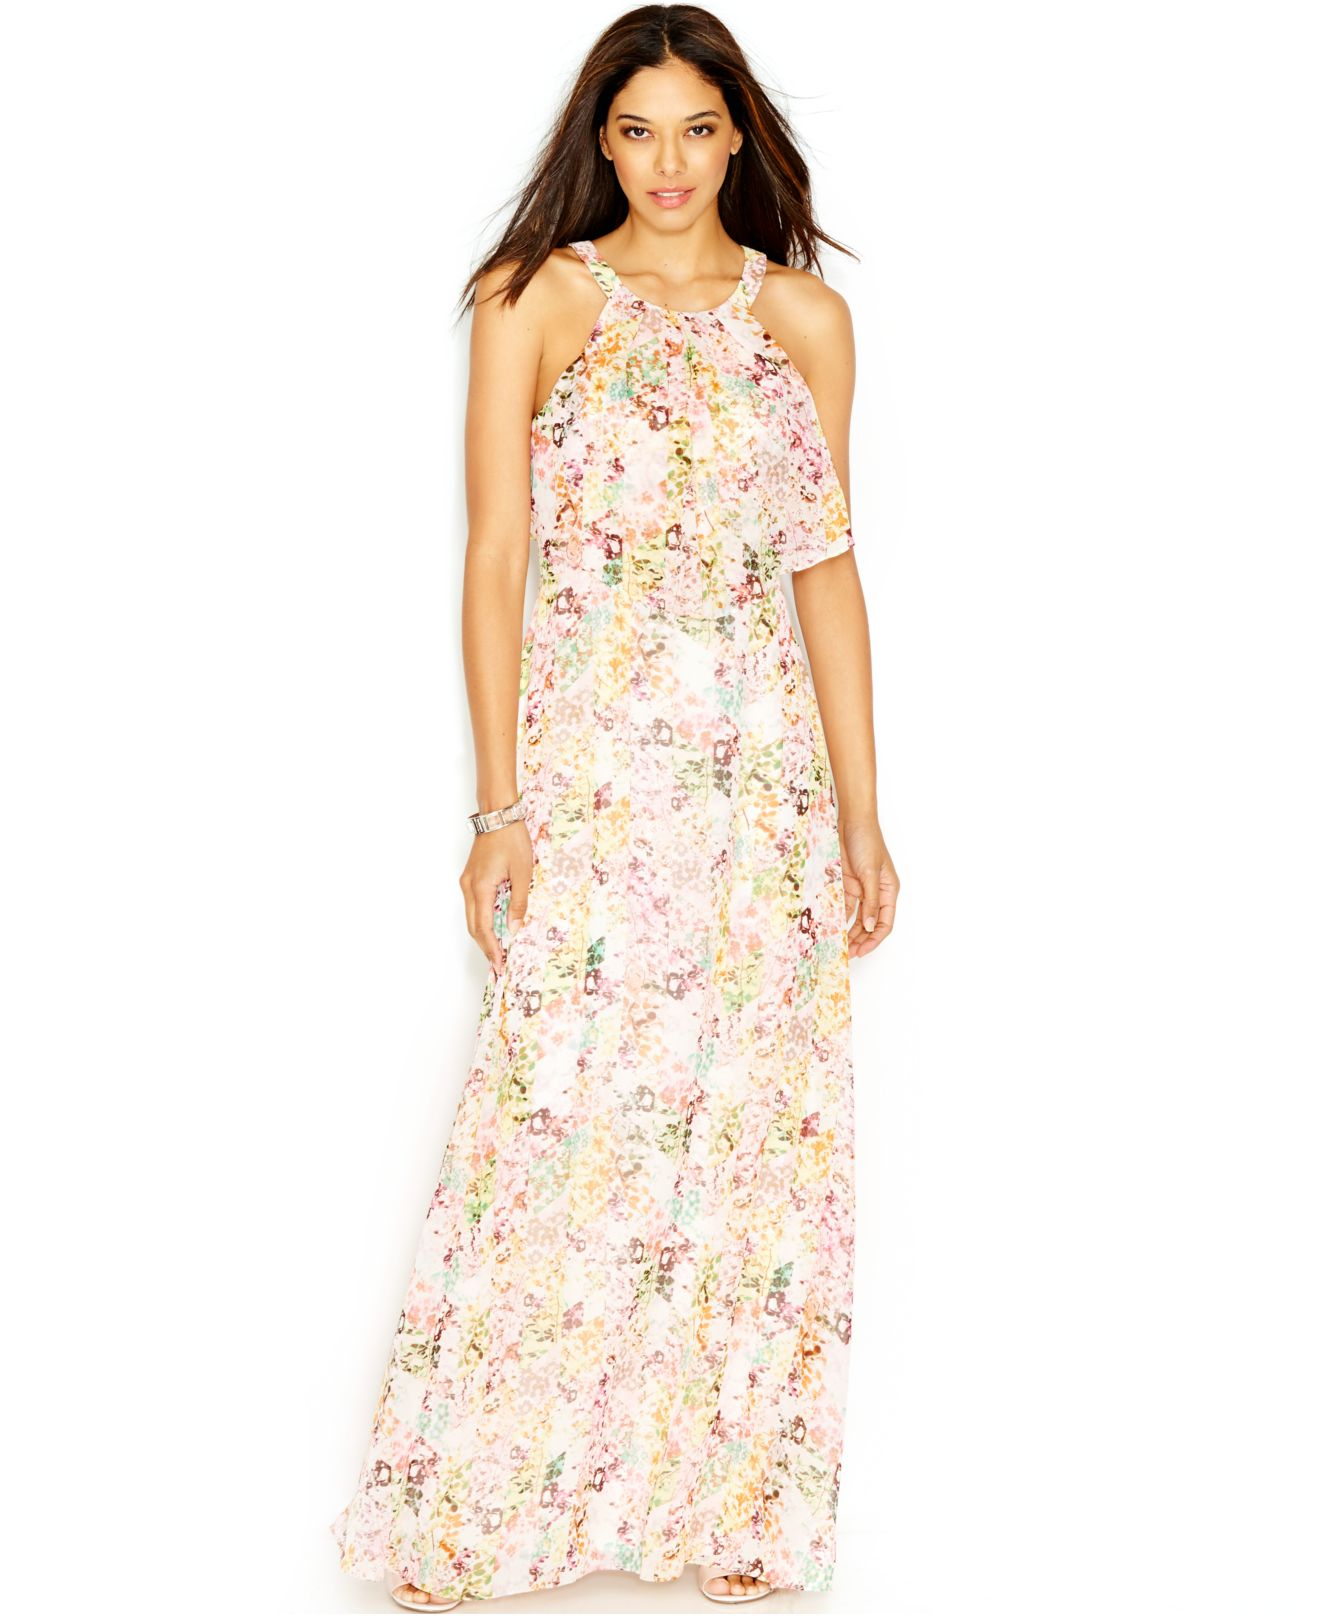 Jessica simpson Floral-Print Popover Maxi Dress | Lyst